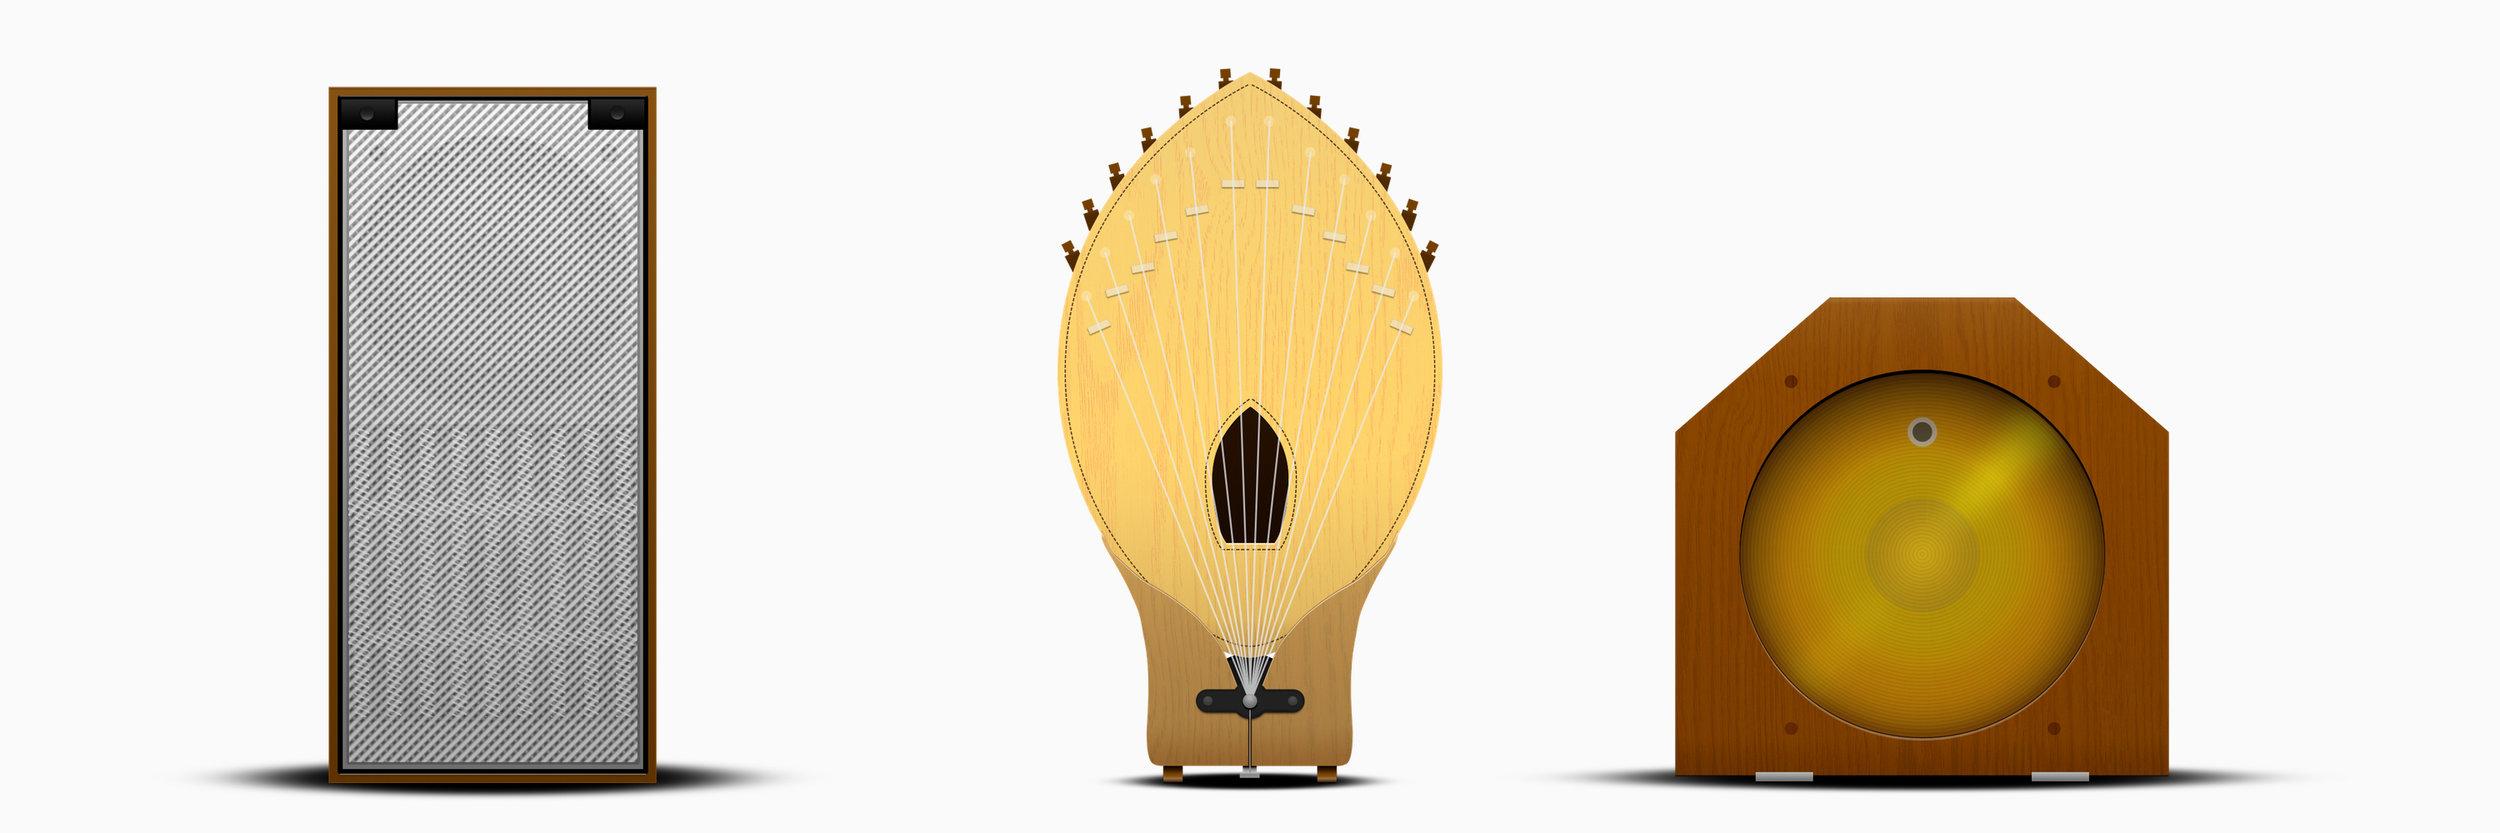 ondes Martenot speakers (Josh Semans, 2019)